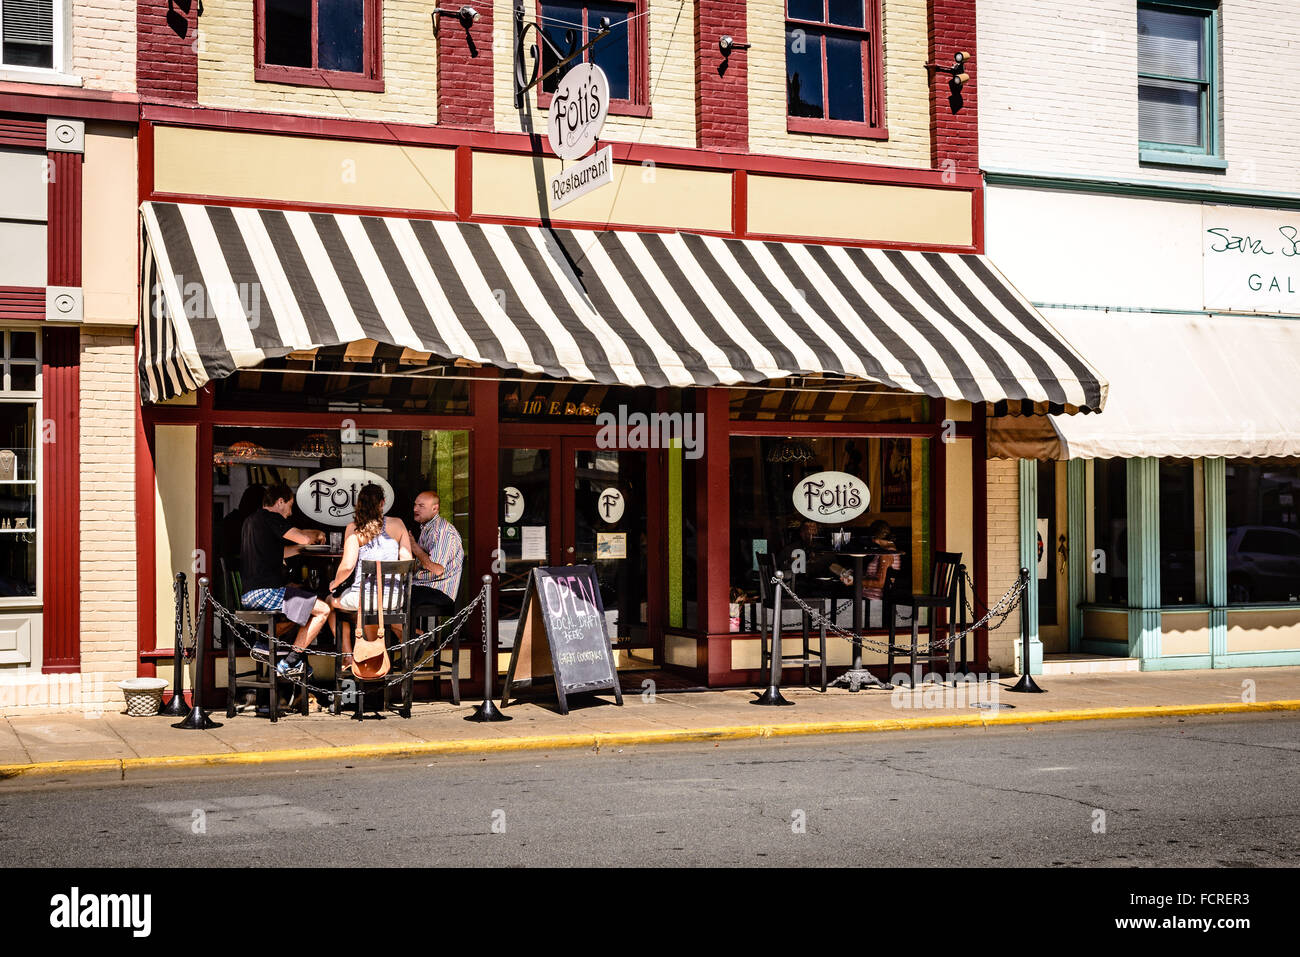 Fotis Restaurant 110 East Davis Street Culpeper Virginia Stock